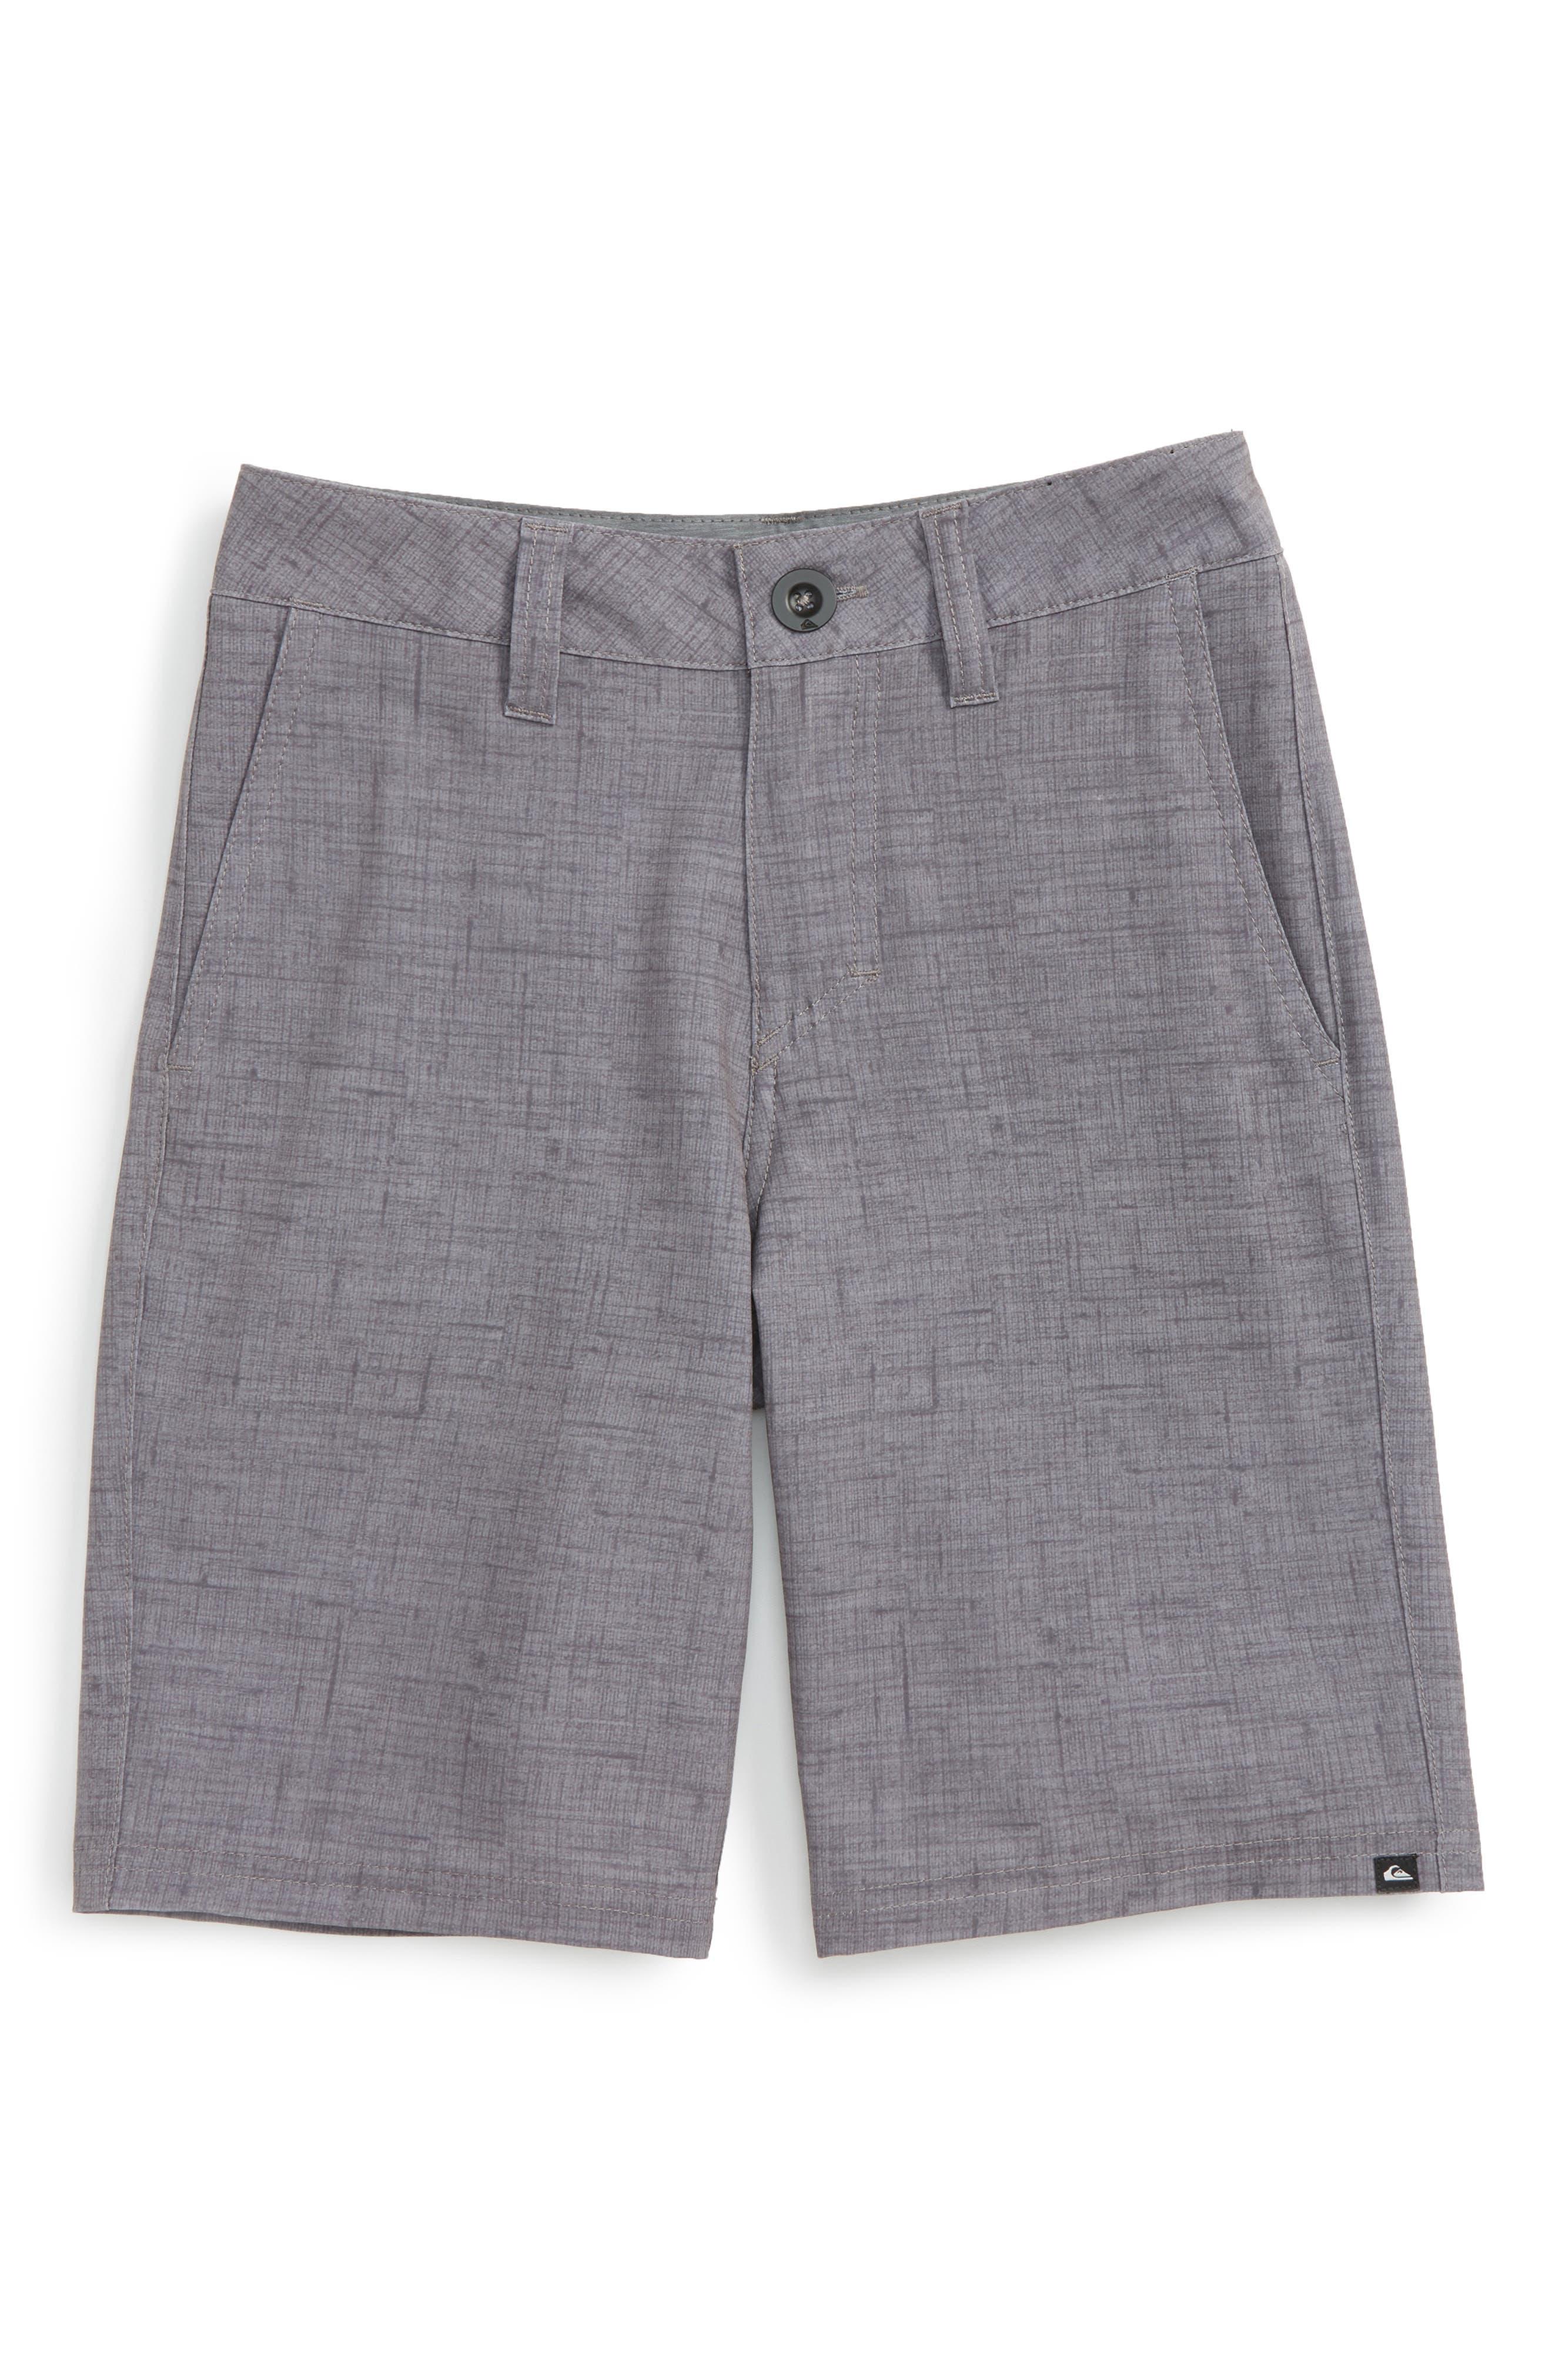 Quiksilver Platypus Amphibian Shorts (Big Boys)